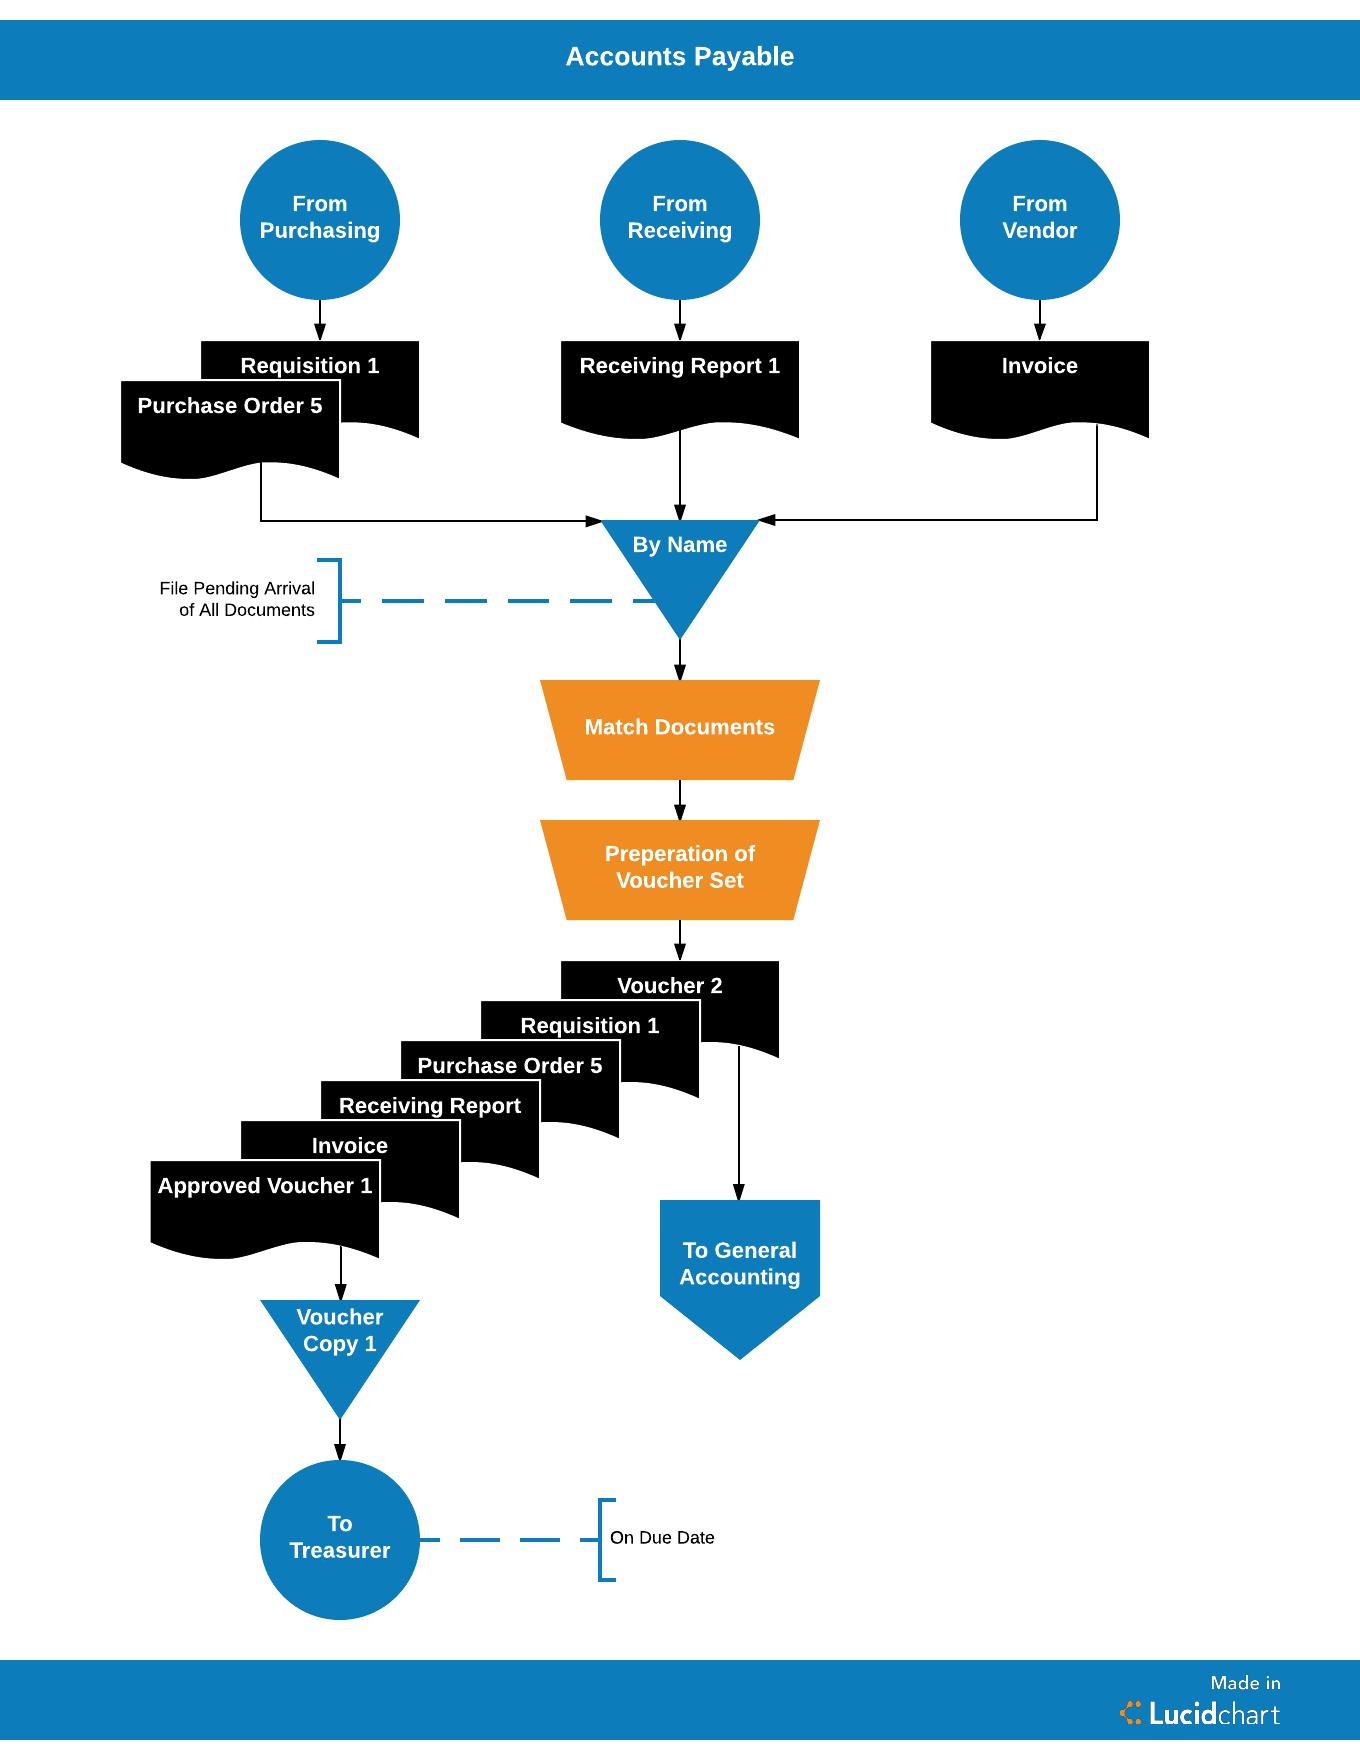 Streamlining The Accounts Payable Process